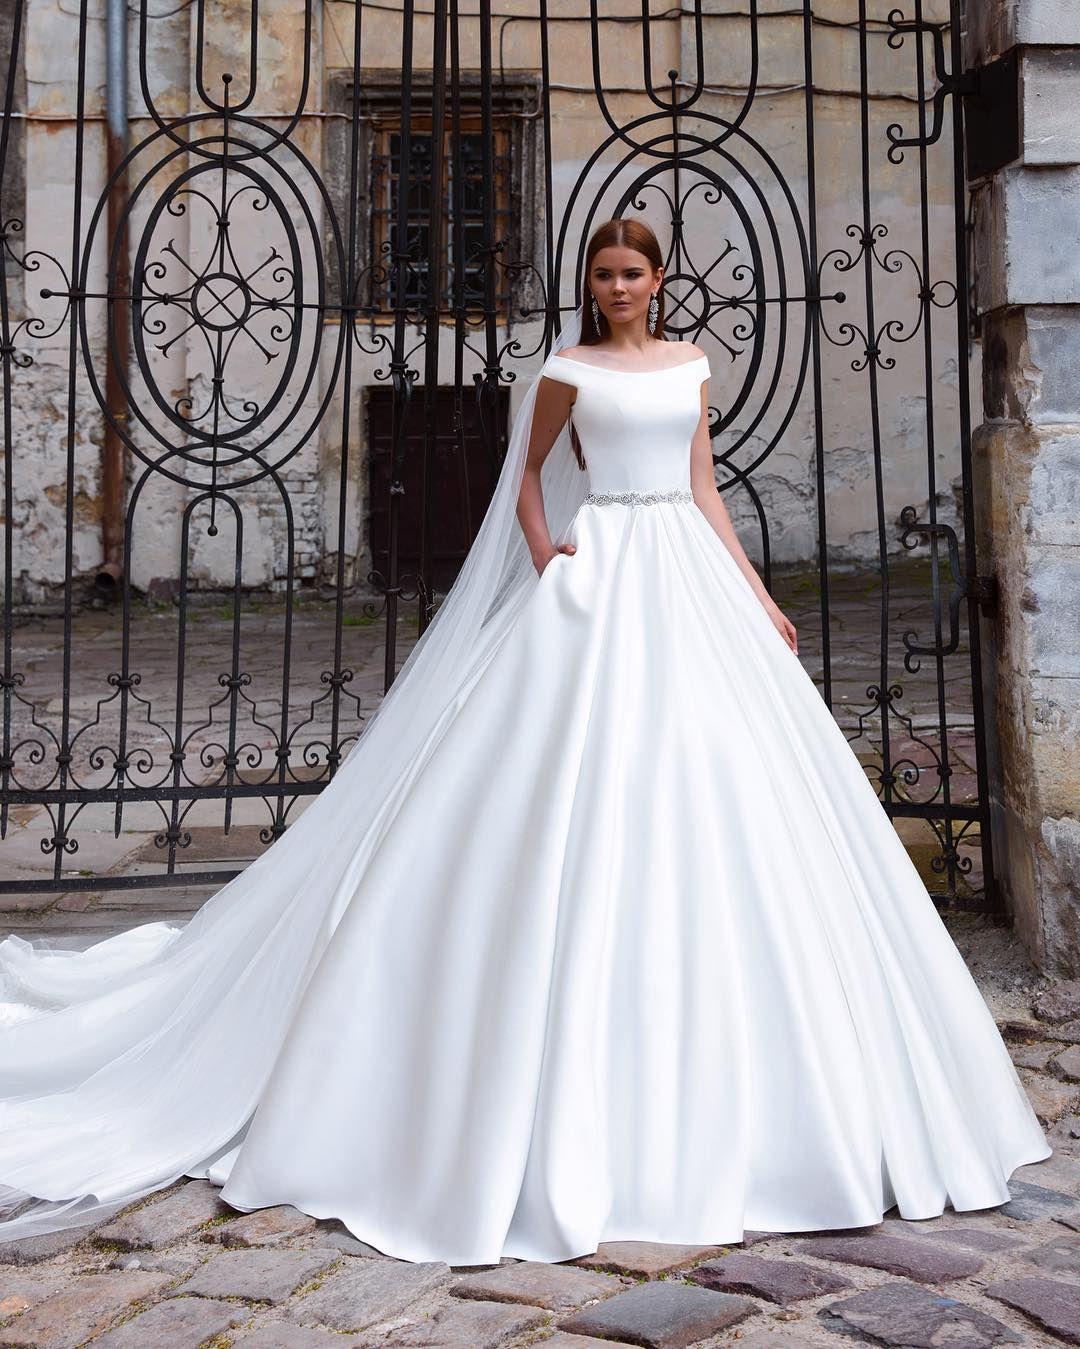 Crystal Design 2016 Wedding Dresses: Www.aroosziba.com سايت عروس زيبا : مدل لباس عروس